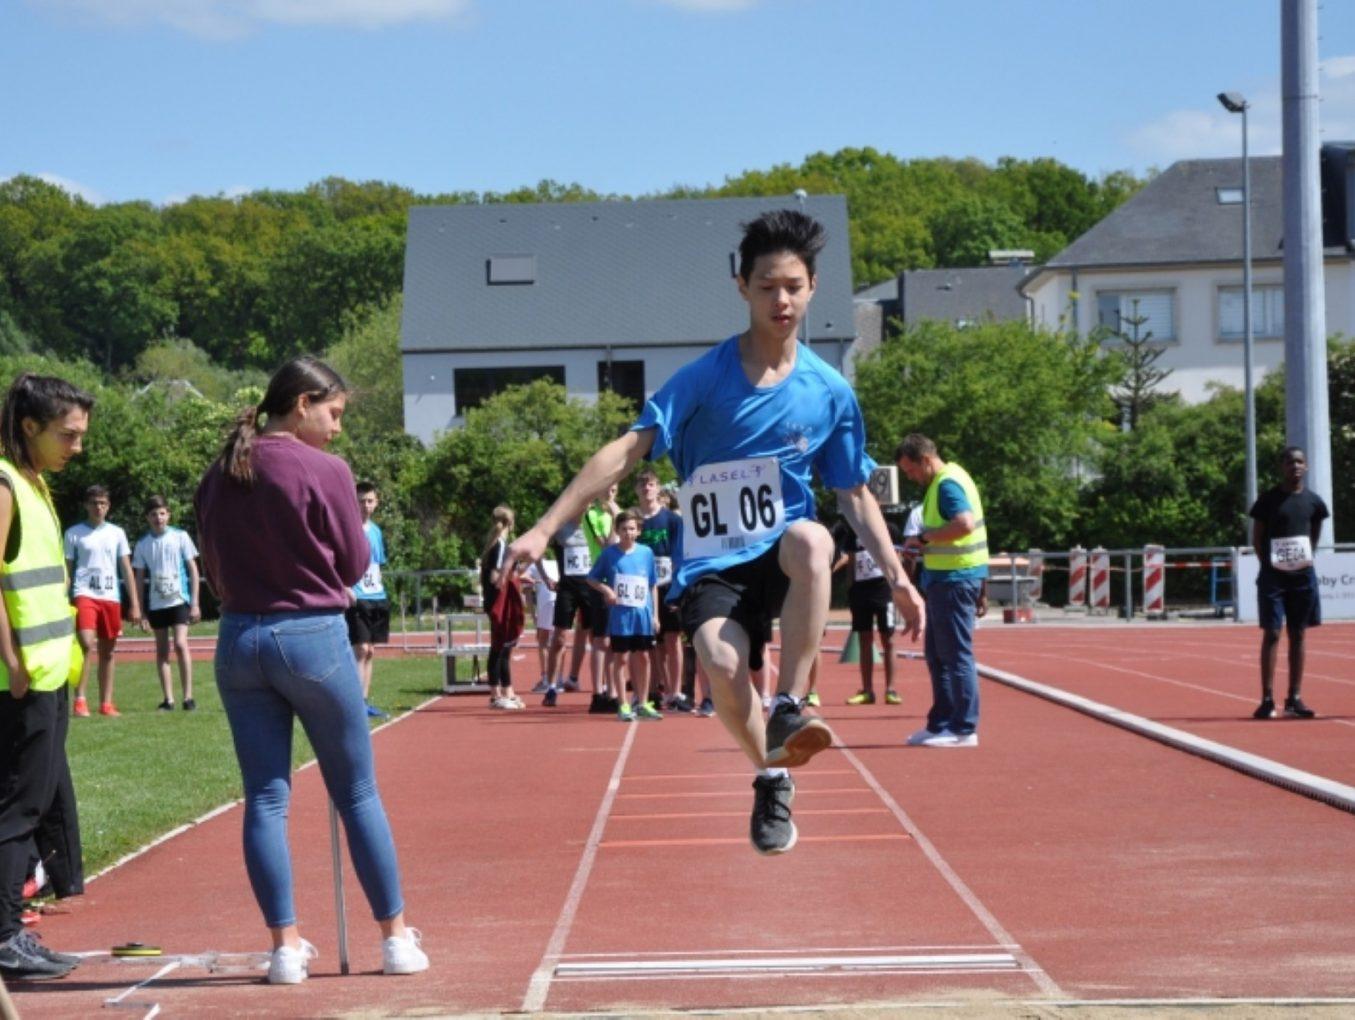 LASEL – Compétitions du 16/05/2019 – Athlétisme, Escalade, Escrime & Football